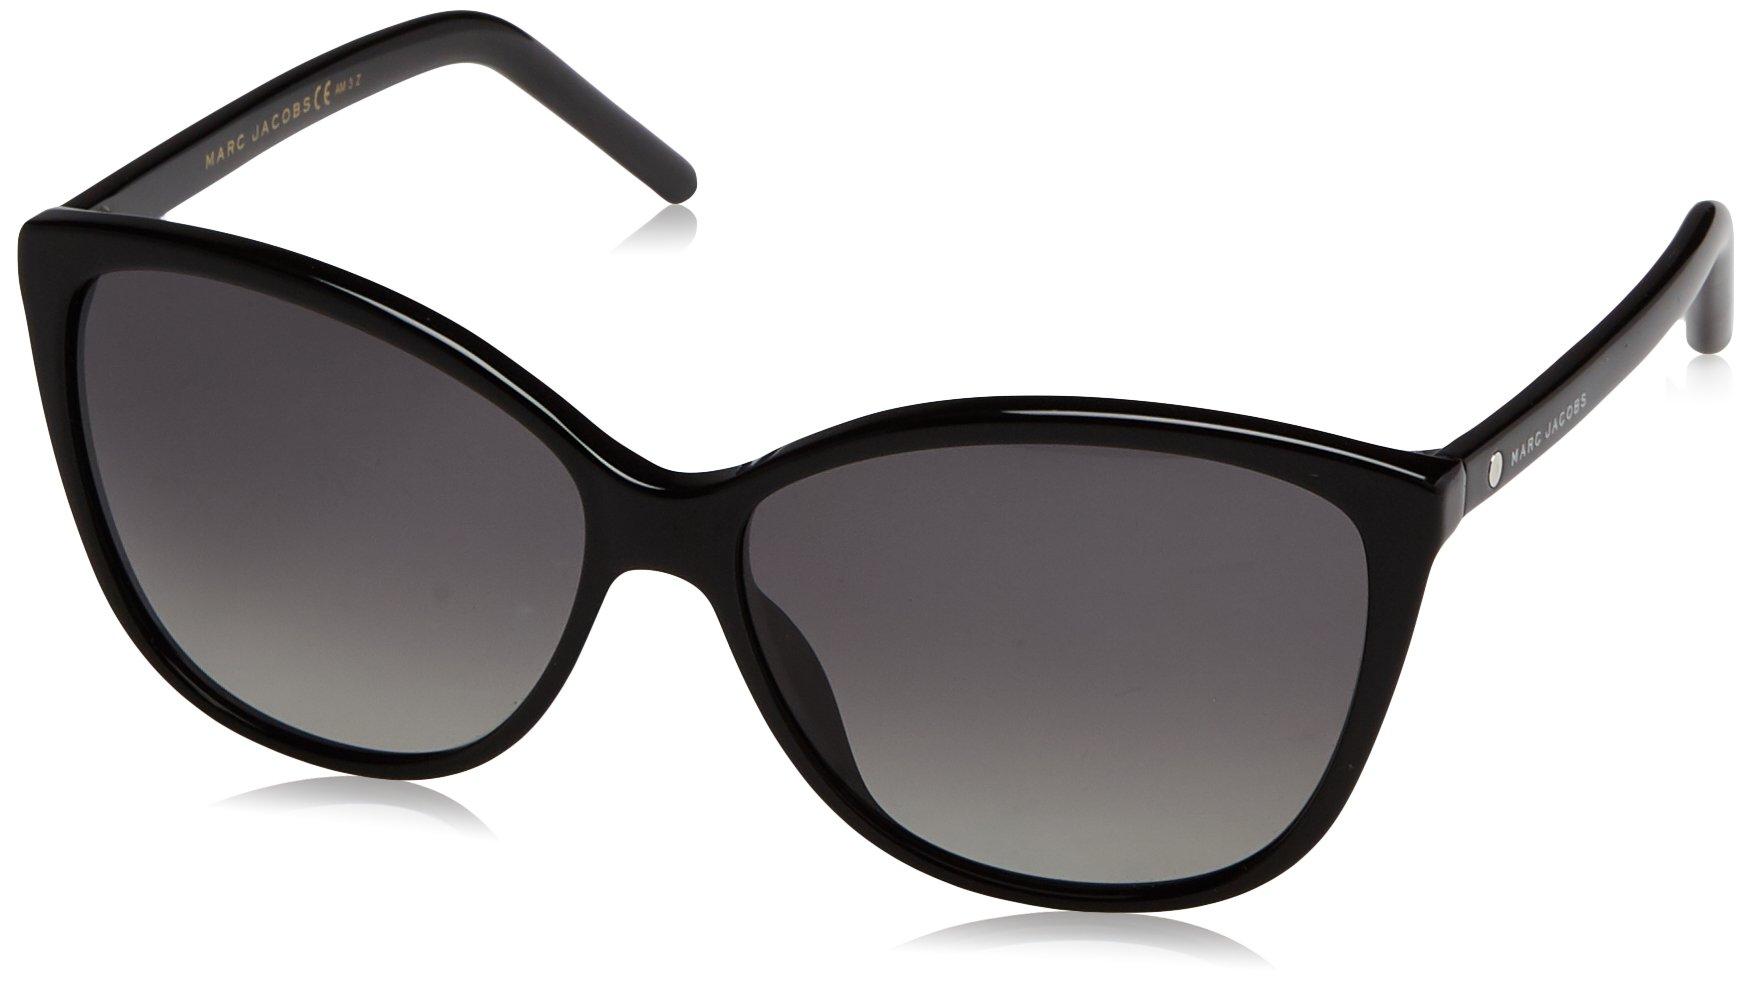 Marc Jacobs Women's Marc69s Polarized Cateye Sunglasses, Black/Gradient Shaded Polarized, 58 mm